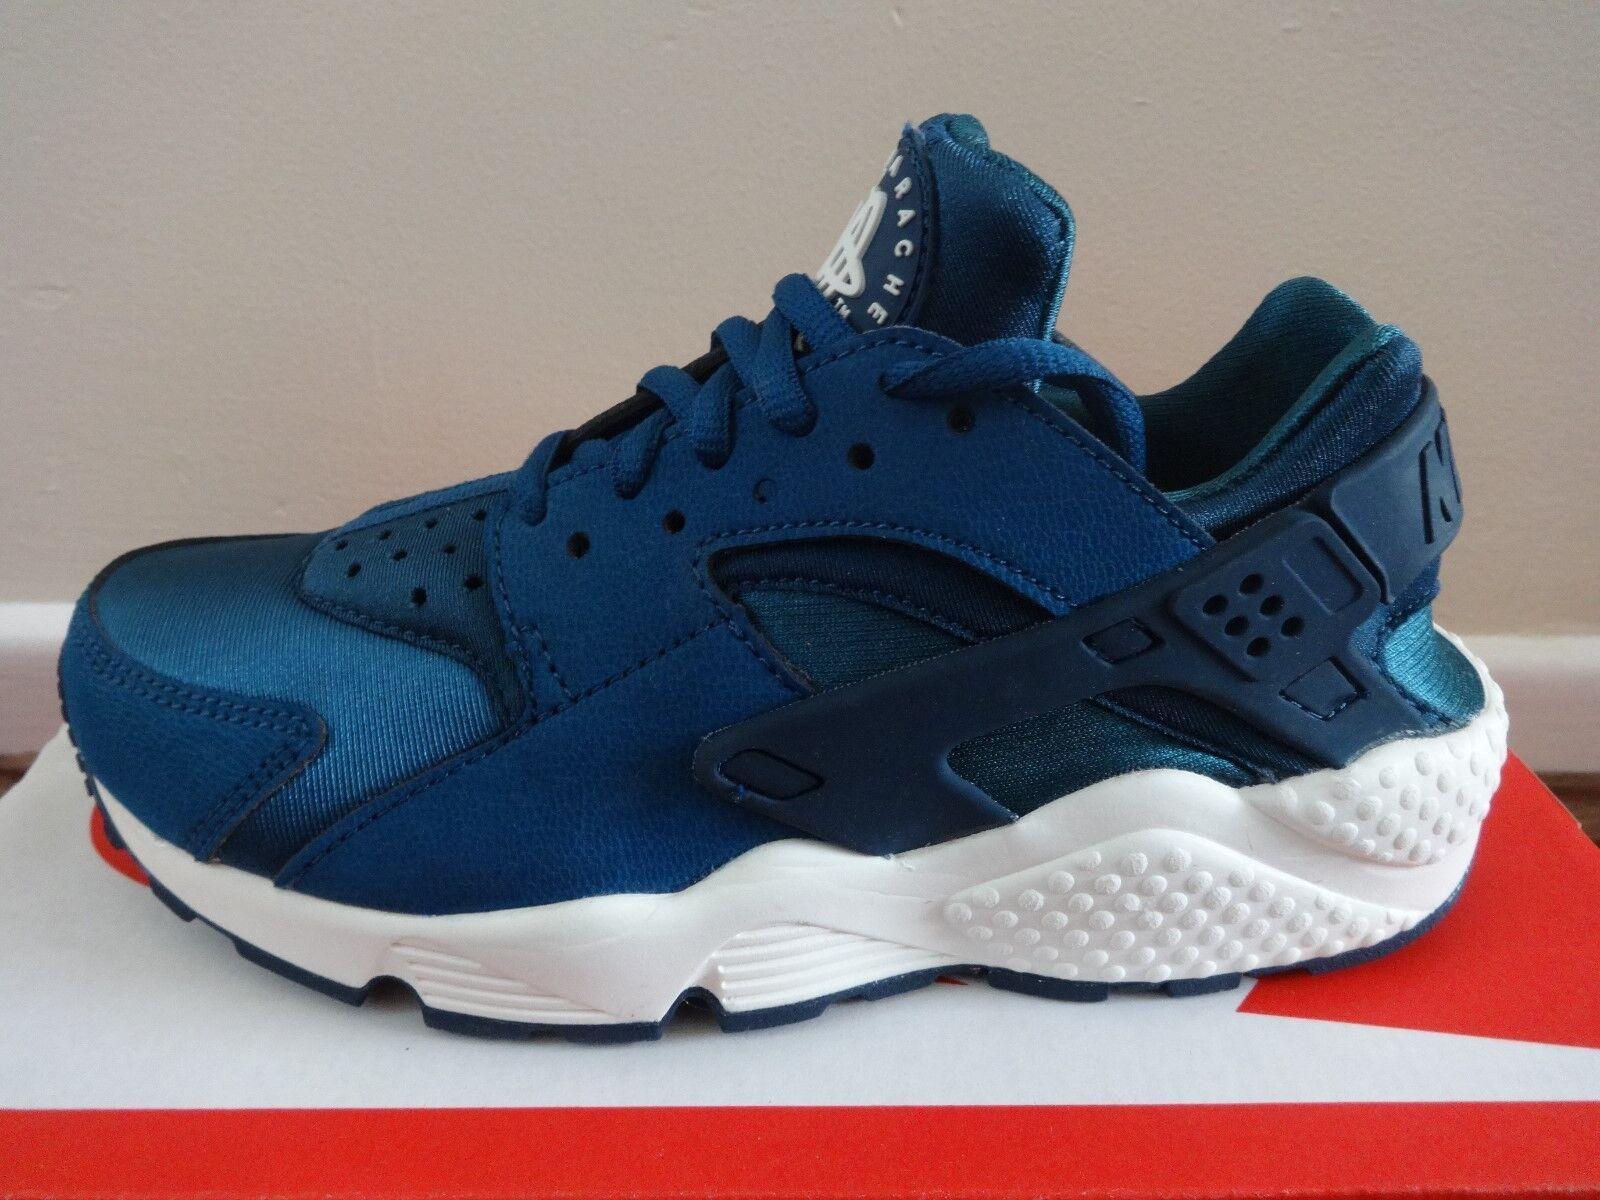 Nike Air Huarache Run Zapatillas para mujer 634835 400 400 400 UK 3 EU 36 nos 5.5 Nuevo En Caja  tienda de descuento